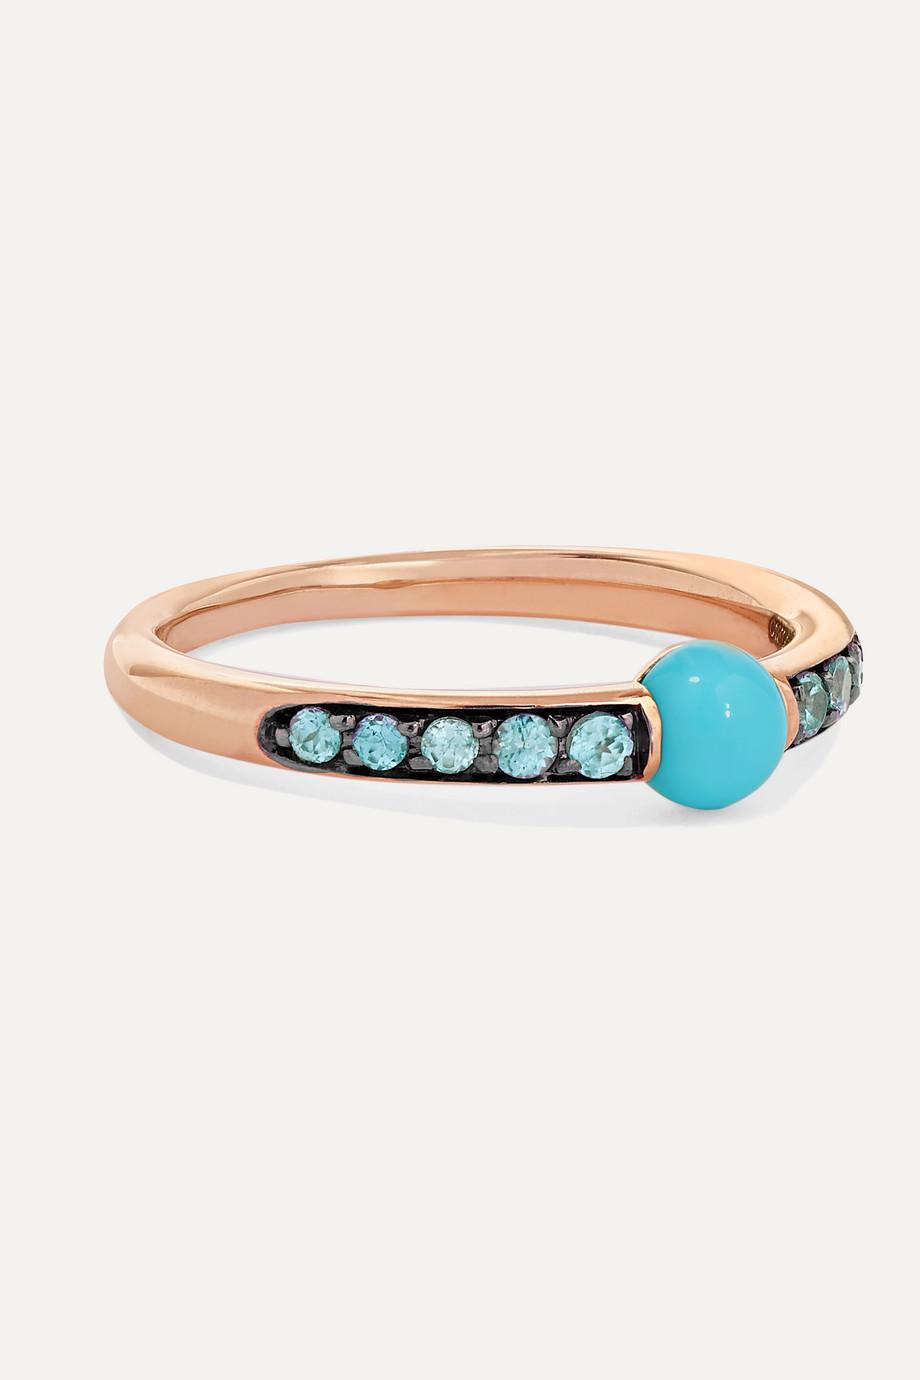 Pomellato 18-karat rose gold, turquoise and zircon ring